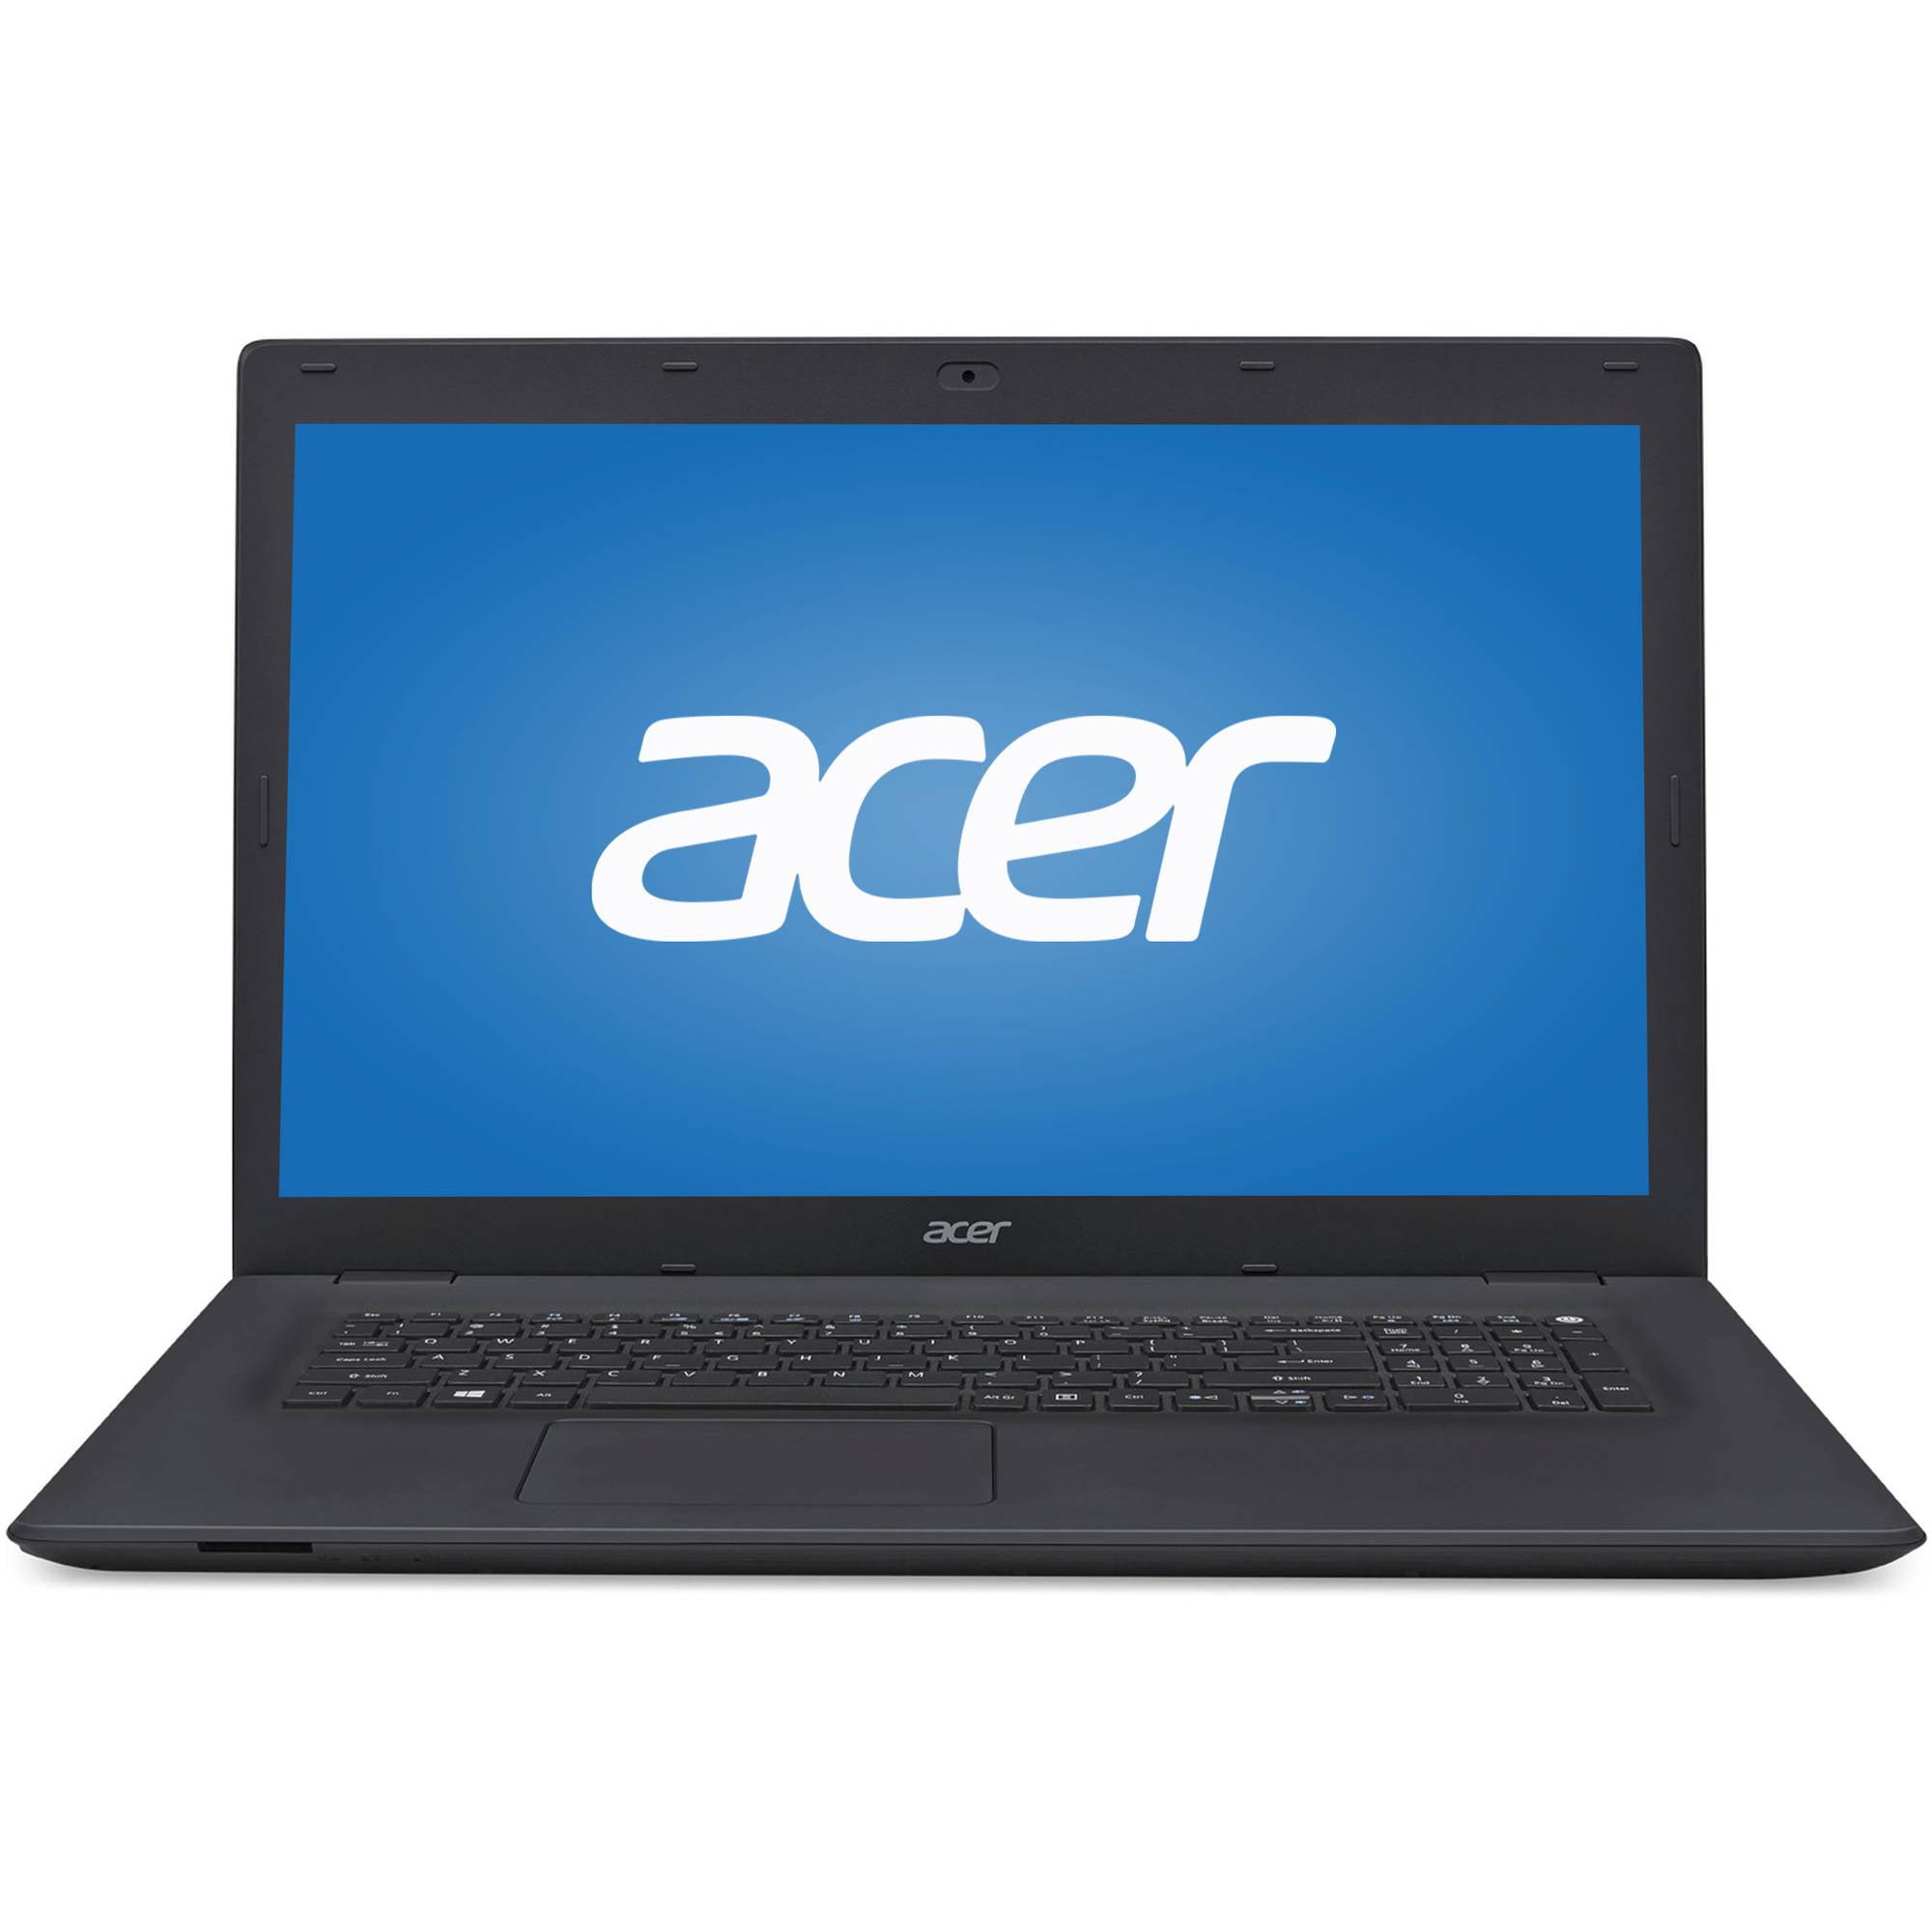 "Acer Black 17.3"" TravelMate P278 TMP278MG52D8 Laptop PC with Intel Core i5-6200U Processor, 8GB Memory, 1TB Hard Drive and Windows 10 Pro"